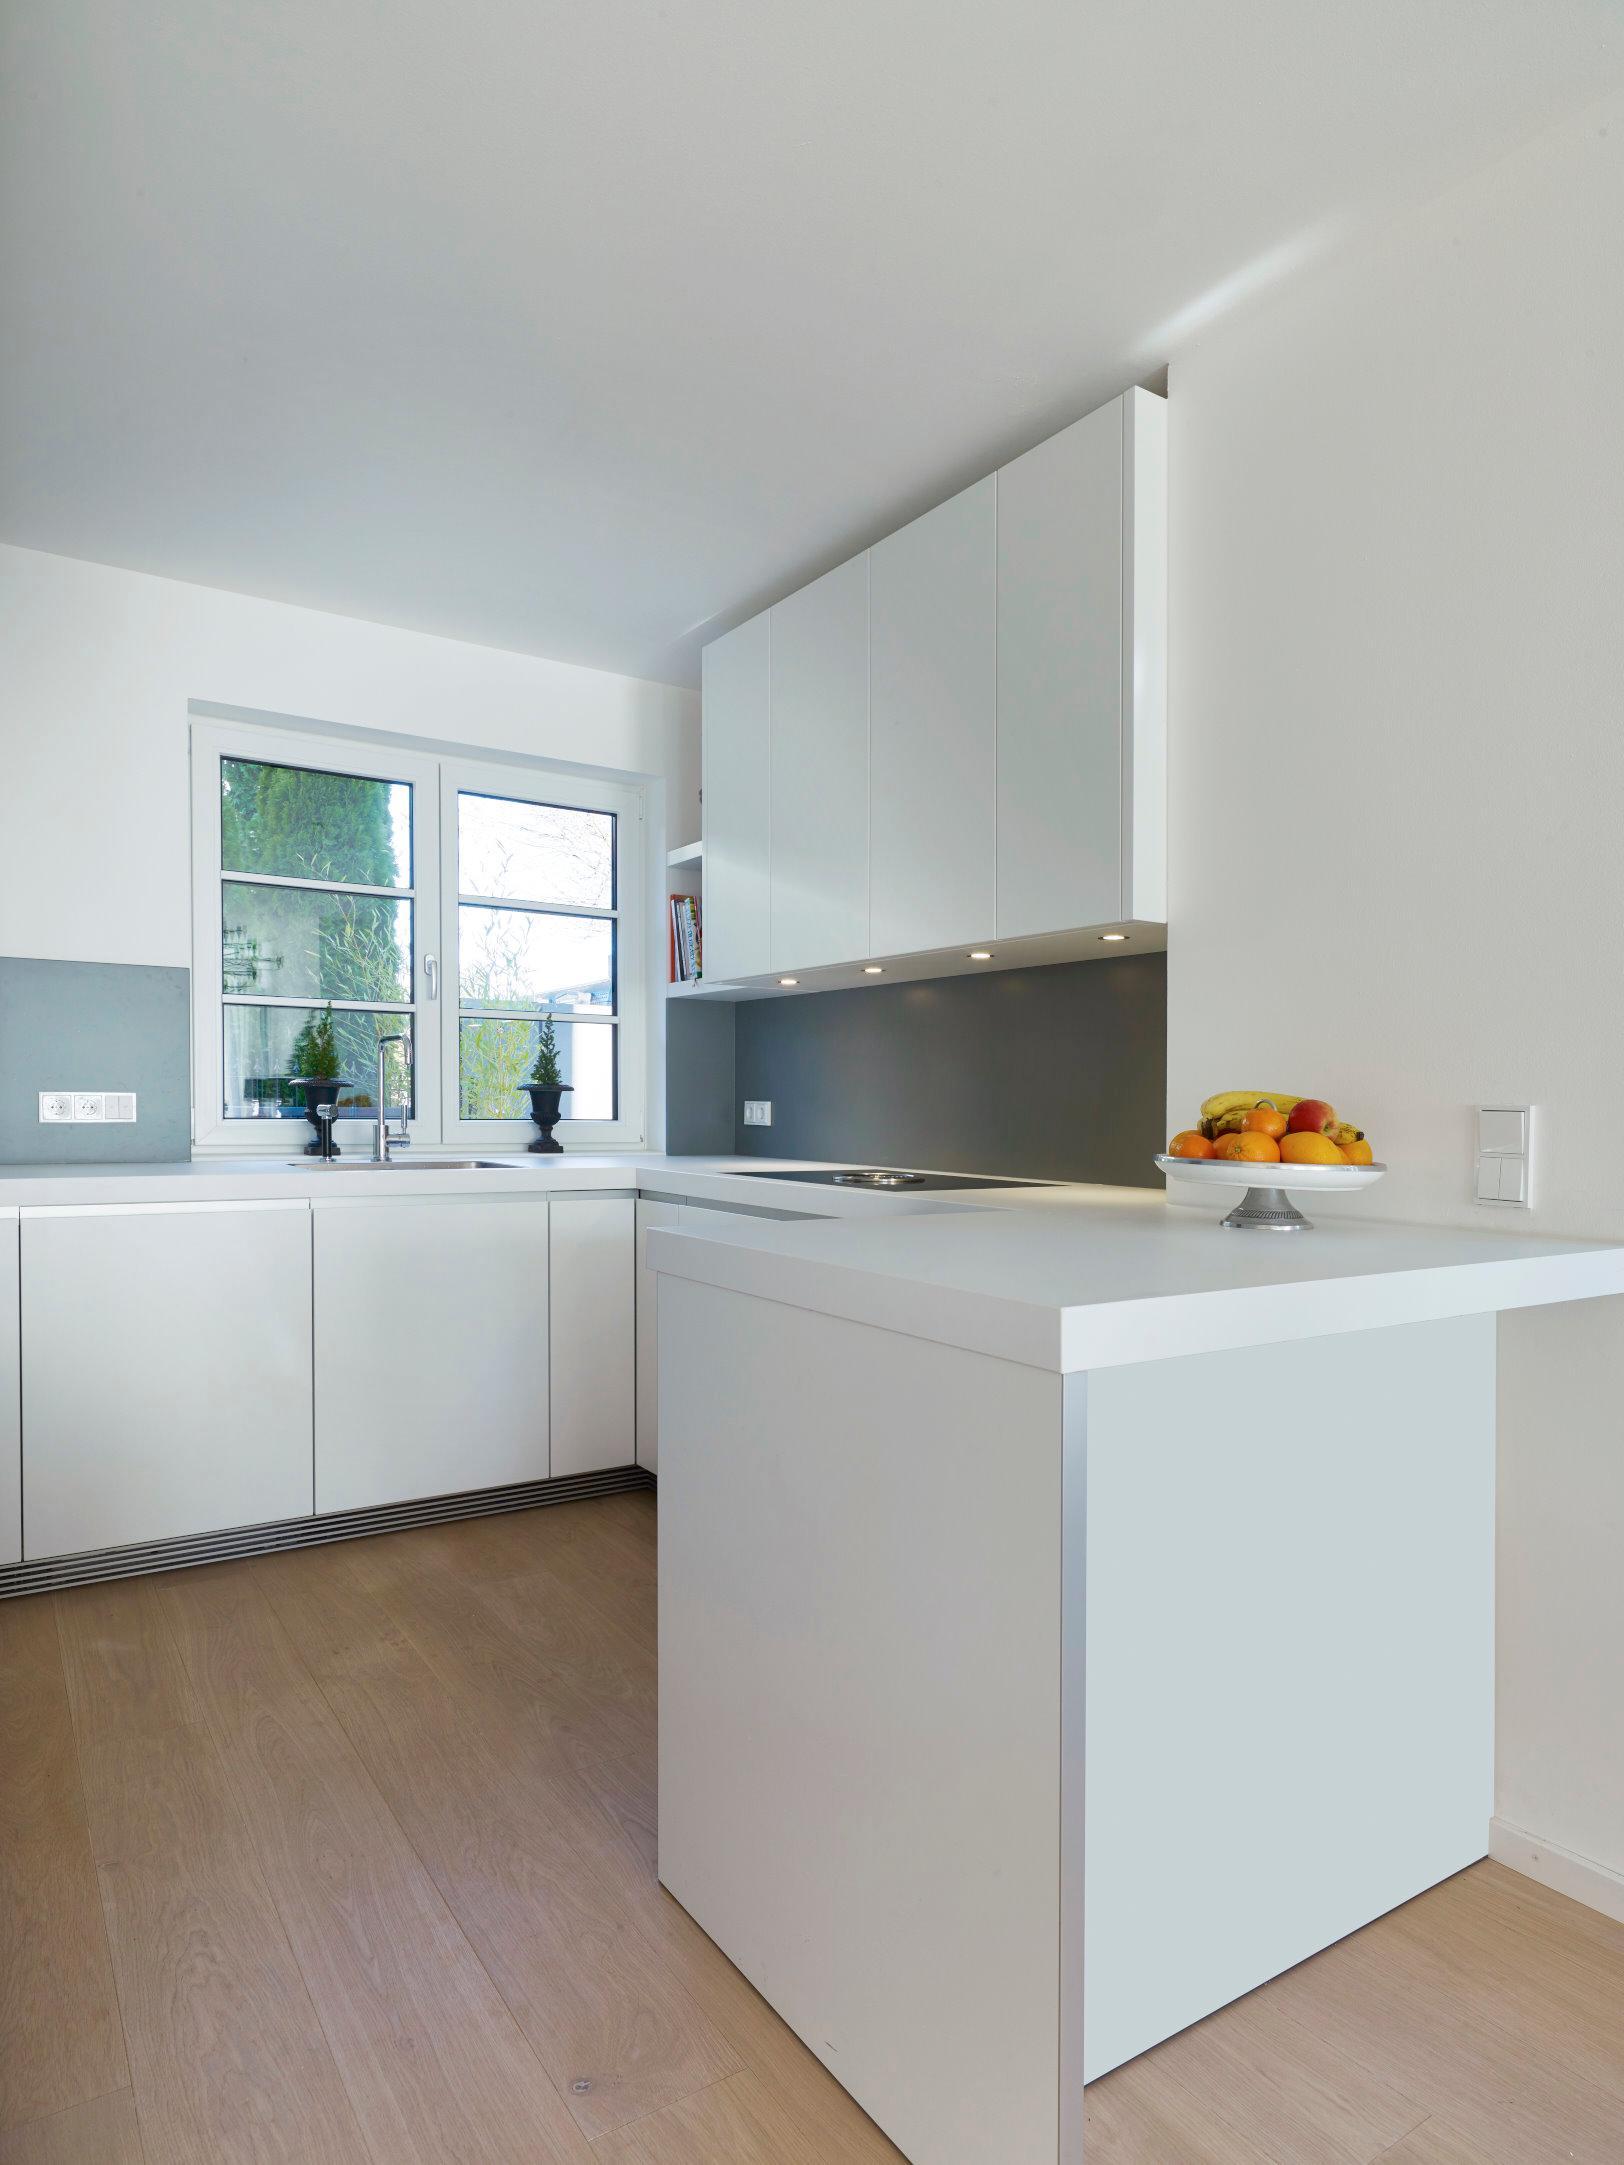 bulthaup b1 lebensraum m nchen 5 k che laminat k. Black Bedroom Furniture Sets. Home Design Ideas